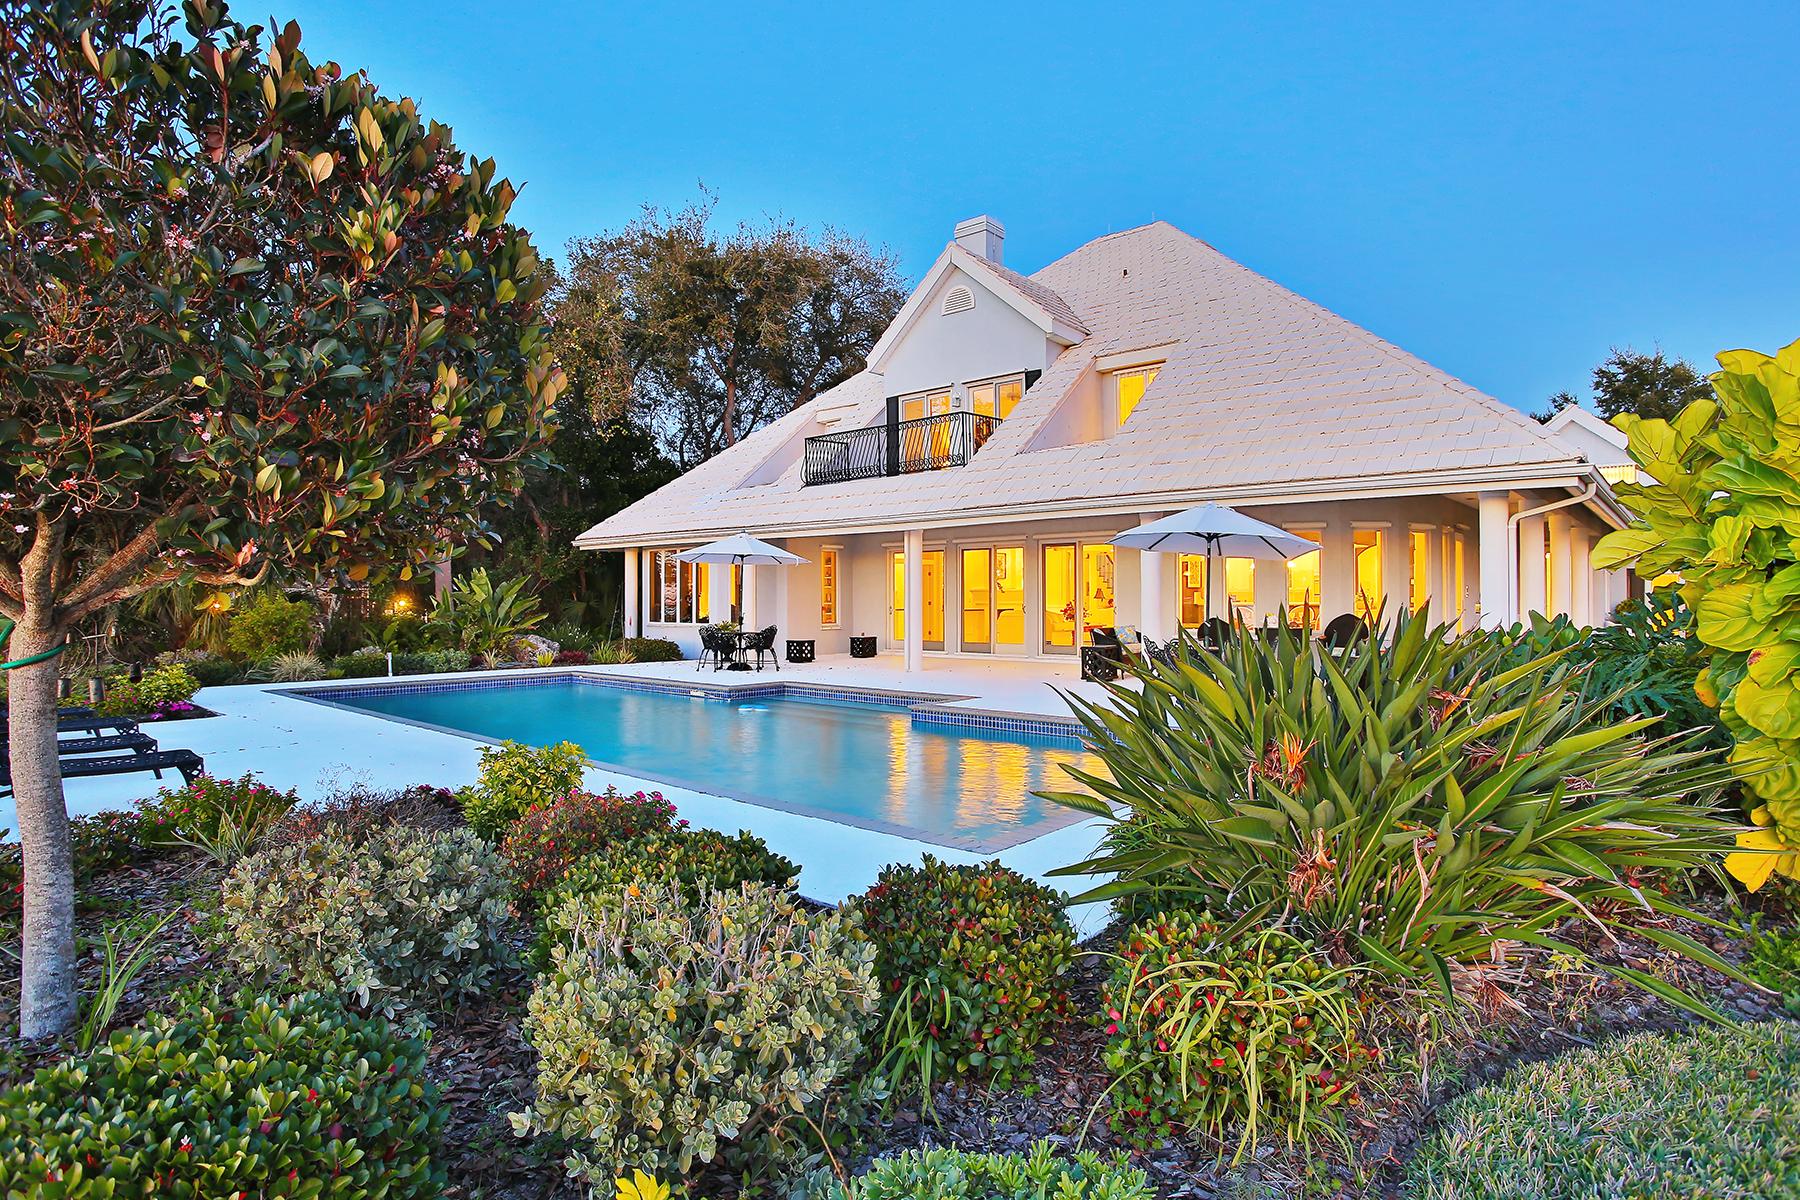 Casa Unifamiliar por un Venta en LONGBAY 8152 Longbay Blvd Sarasota, Florida 34243 Estados Unidos